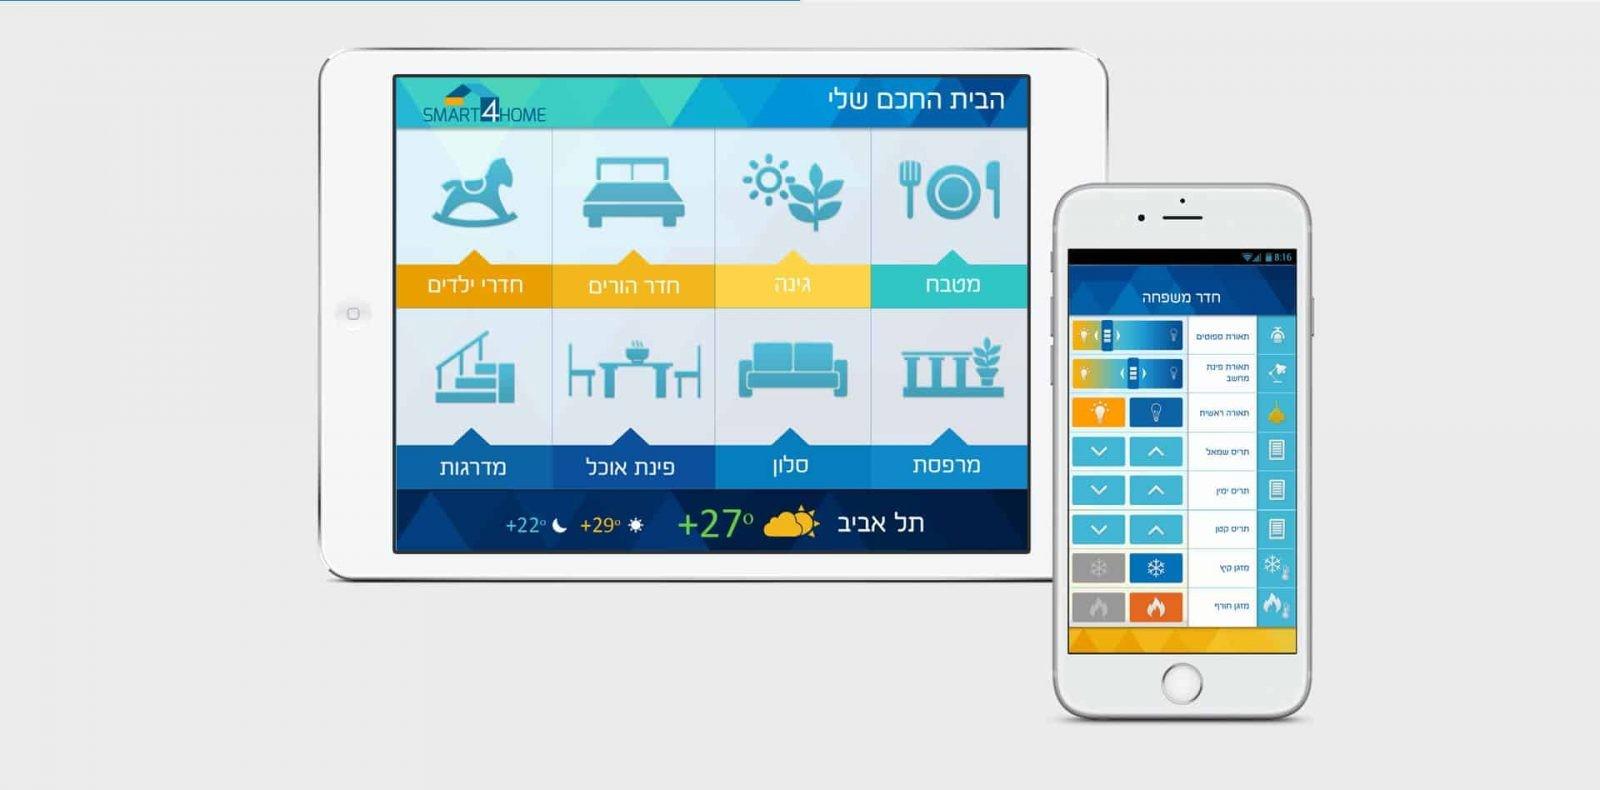 smart4home, מיתוג לעסק, עיצוב אפליקציה